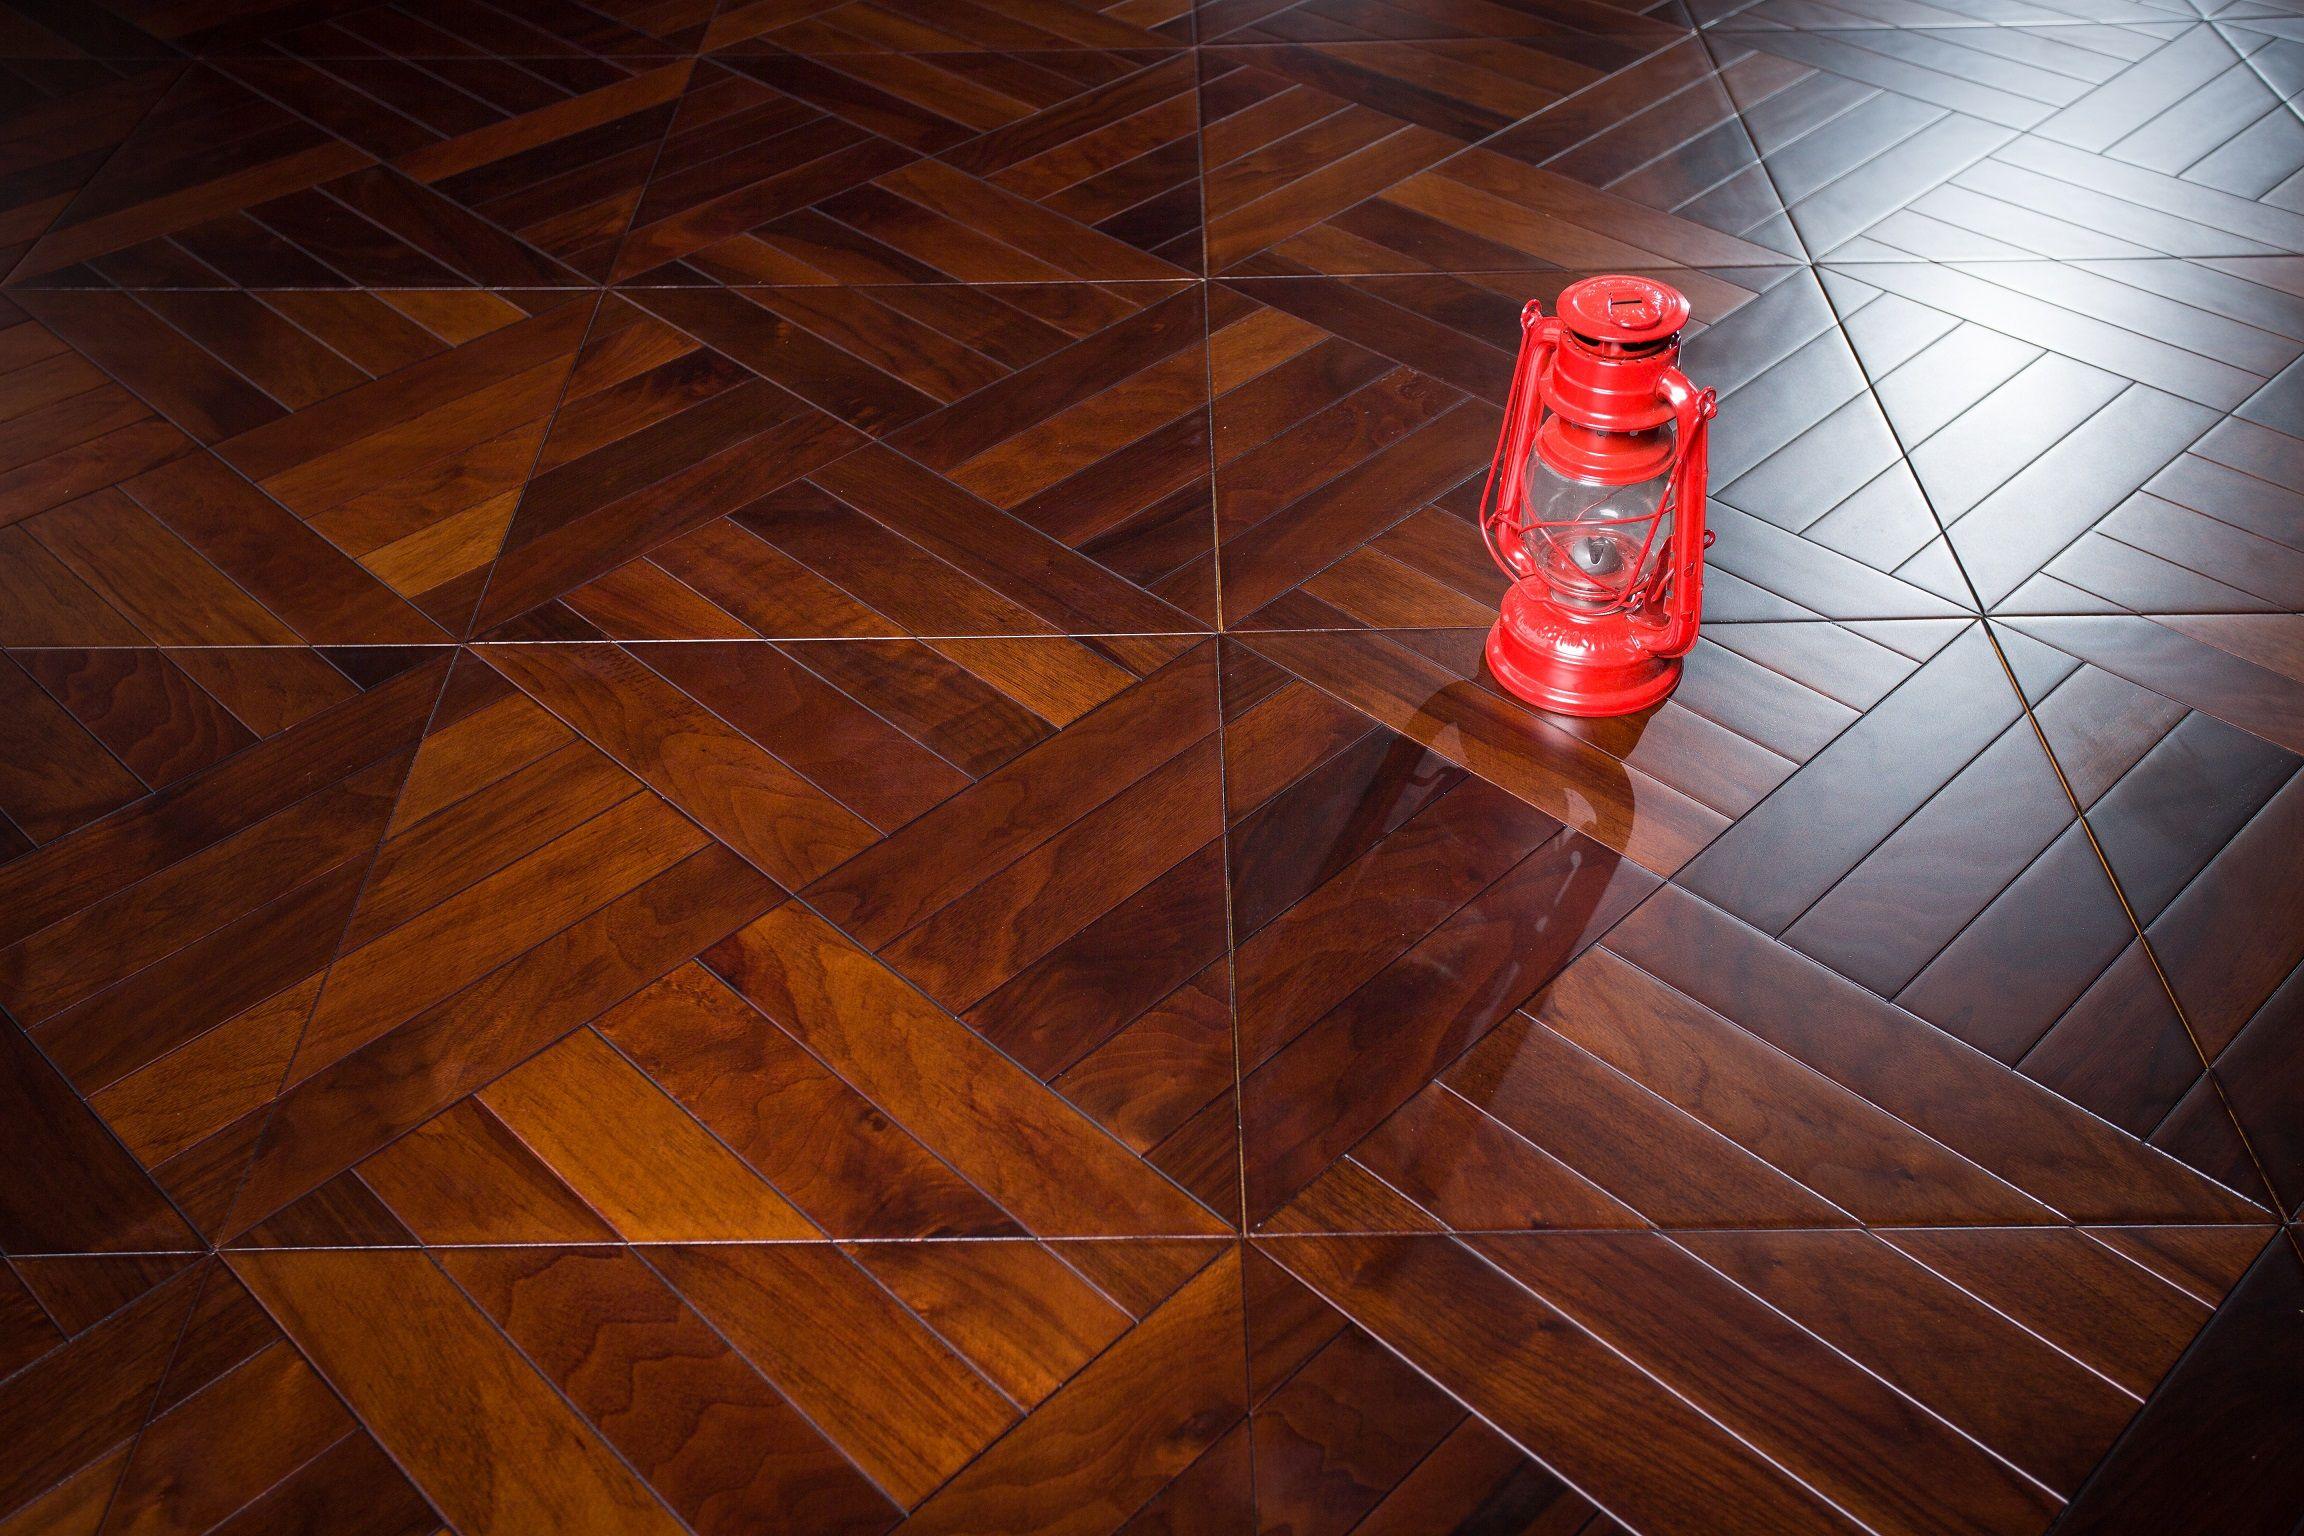 American Walnut Black color wood flooring hardwood parquet tile square shape marquetry inlay art deco interior wallpaper carpet High-end custom Designed